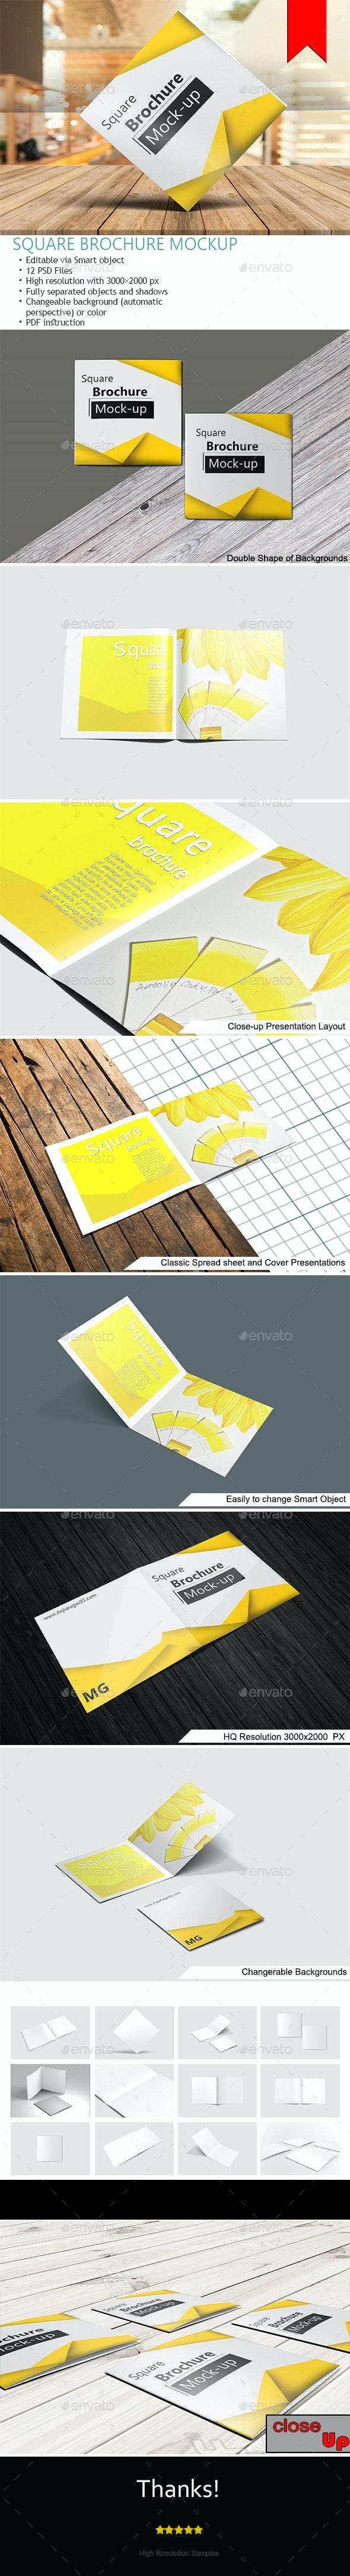 Square Bifold Brochure Mockups - Brochures Print